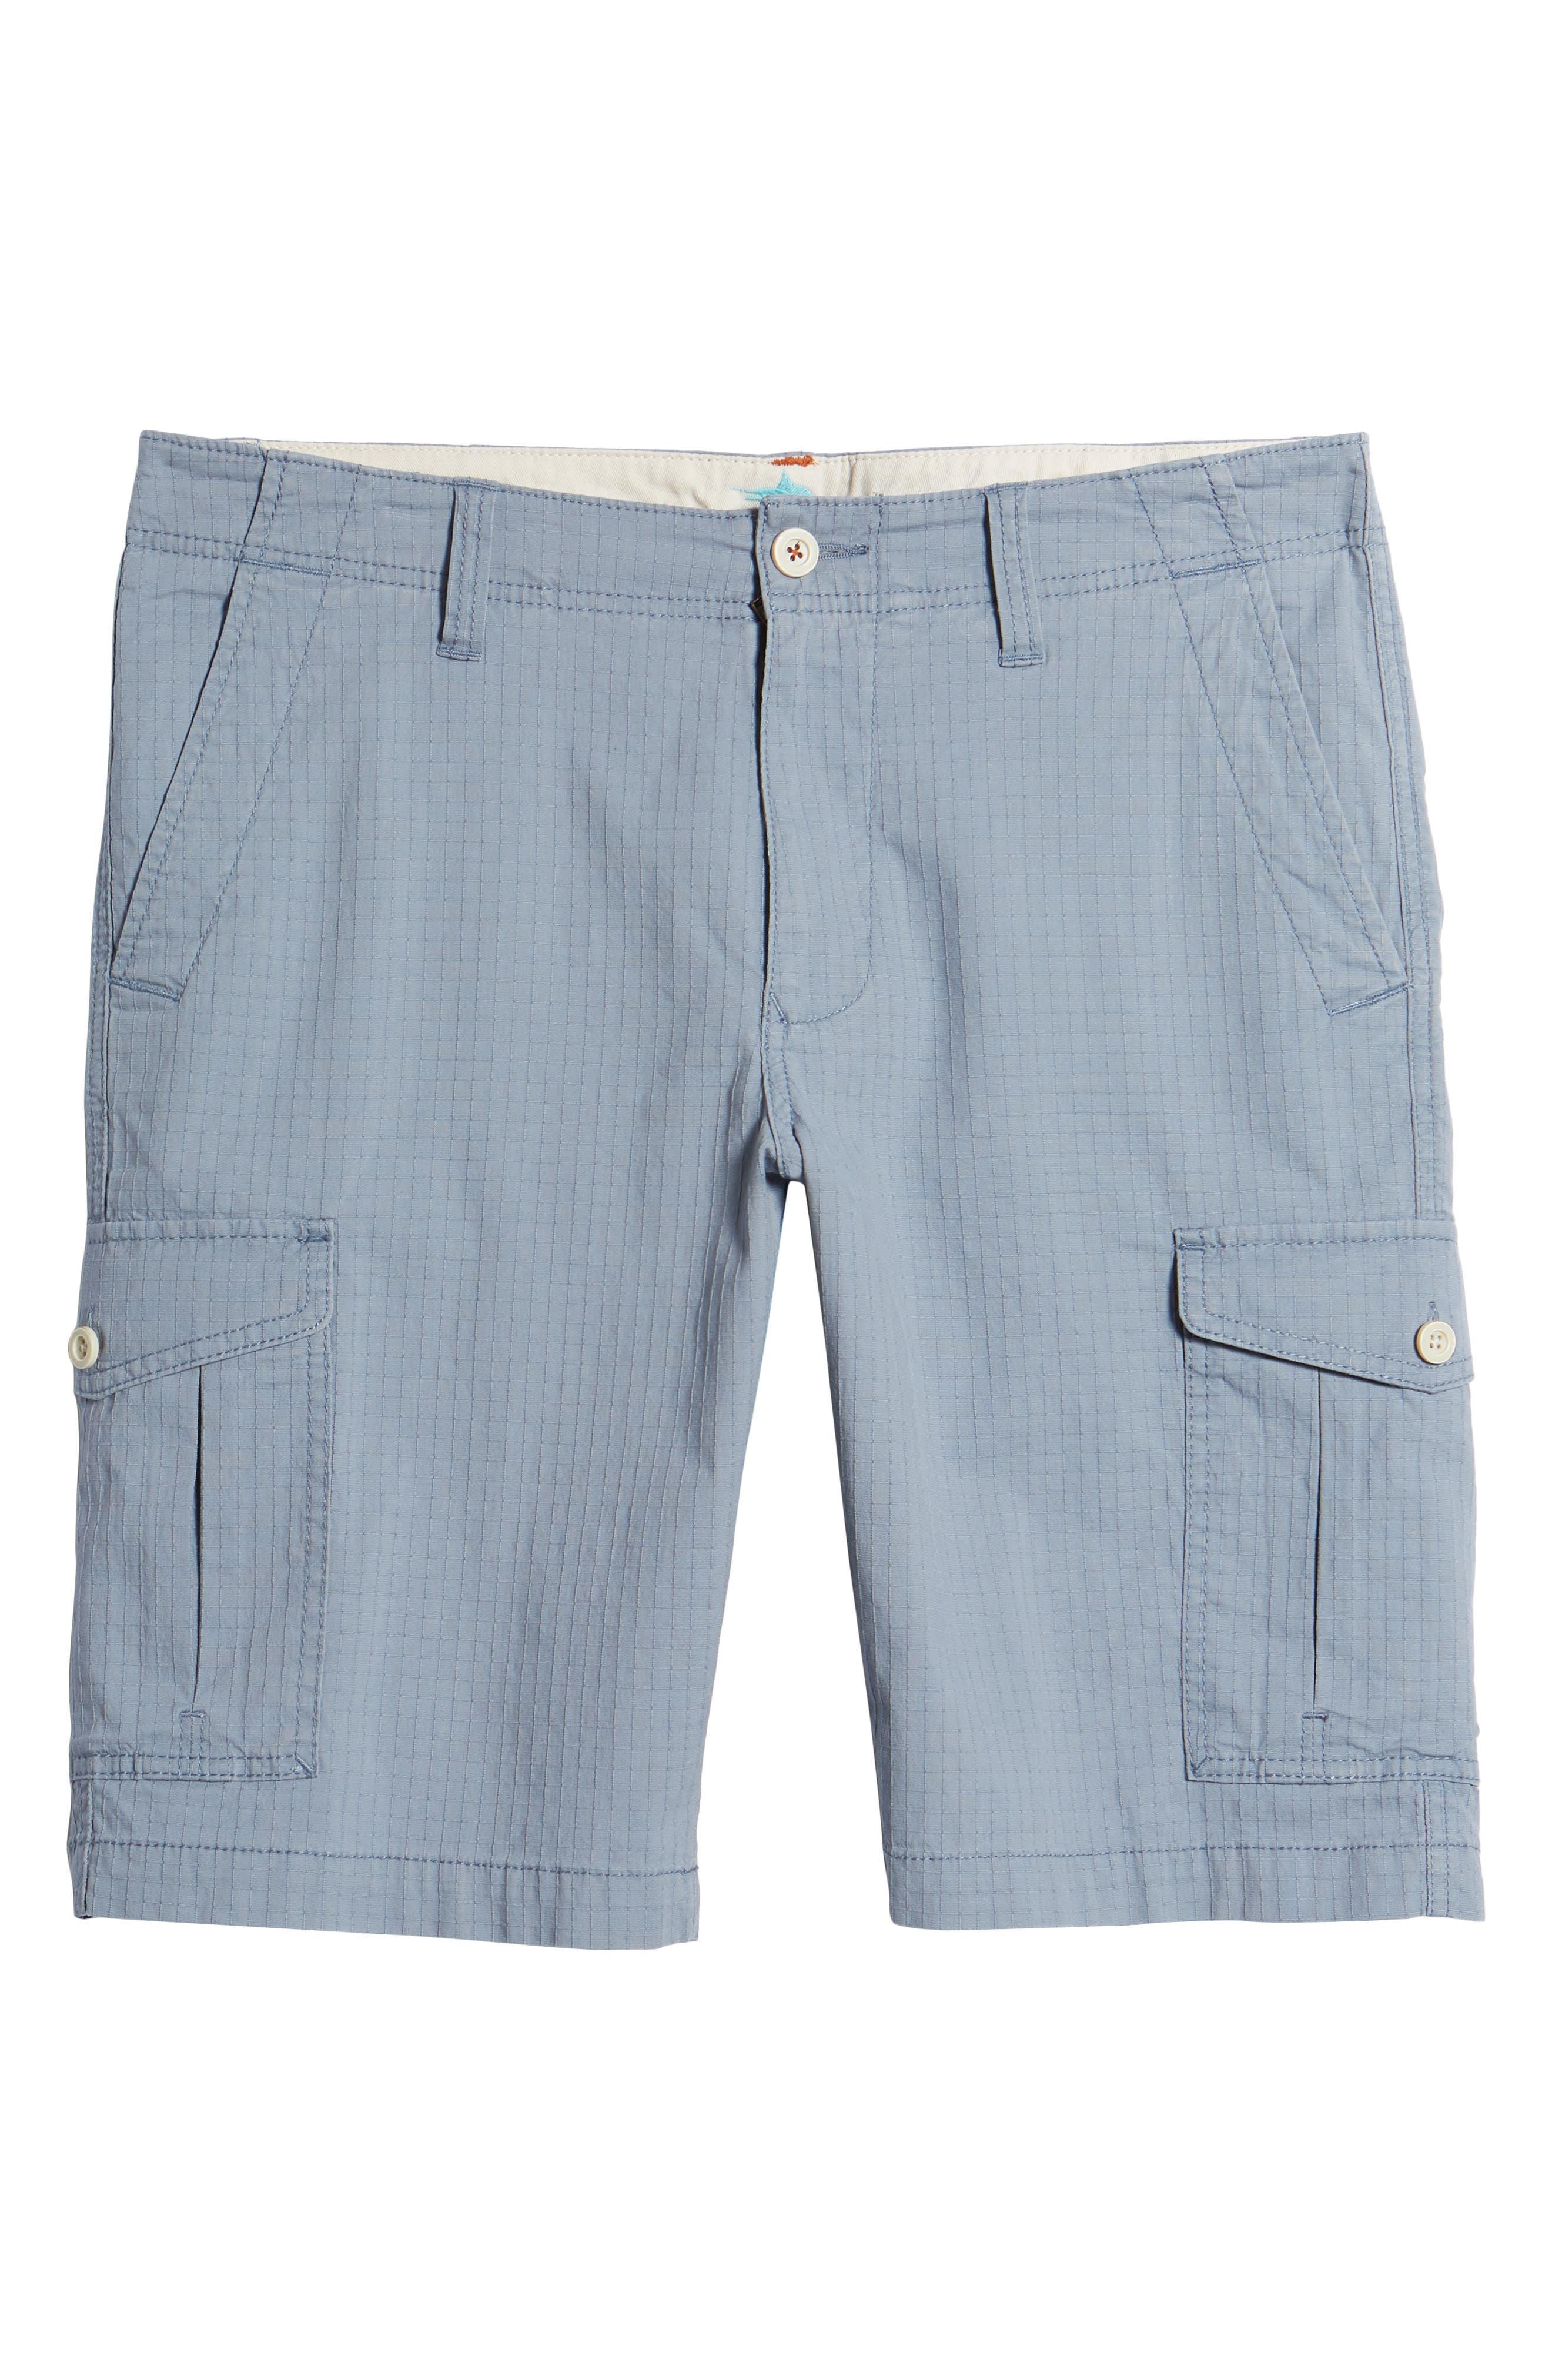 Sandbar Ripstop Cargo Shorts,                             Alternate thumbnail 6, color,                             401